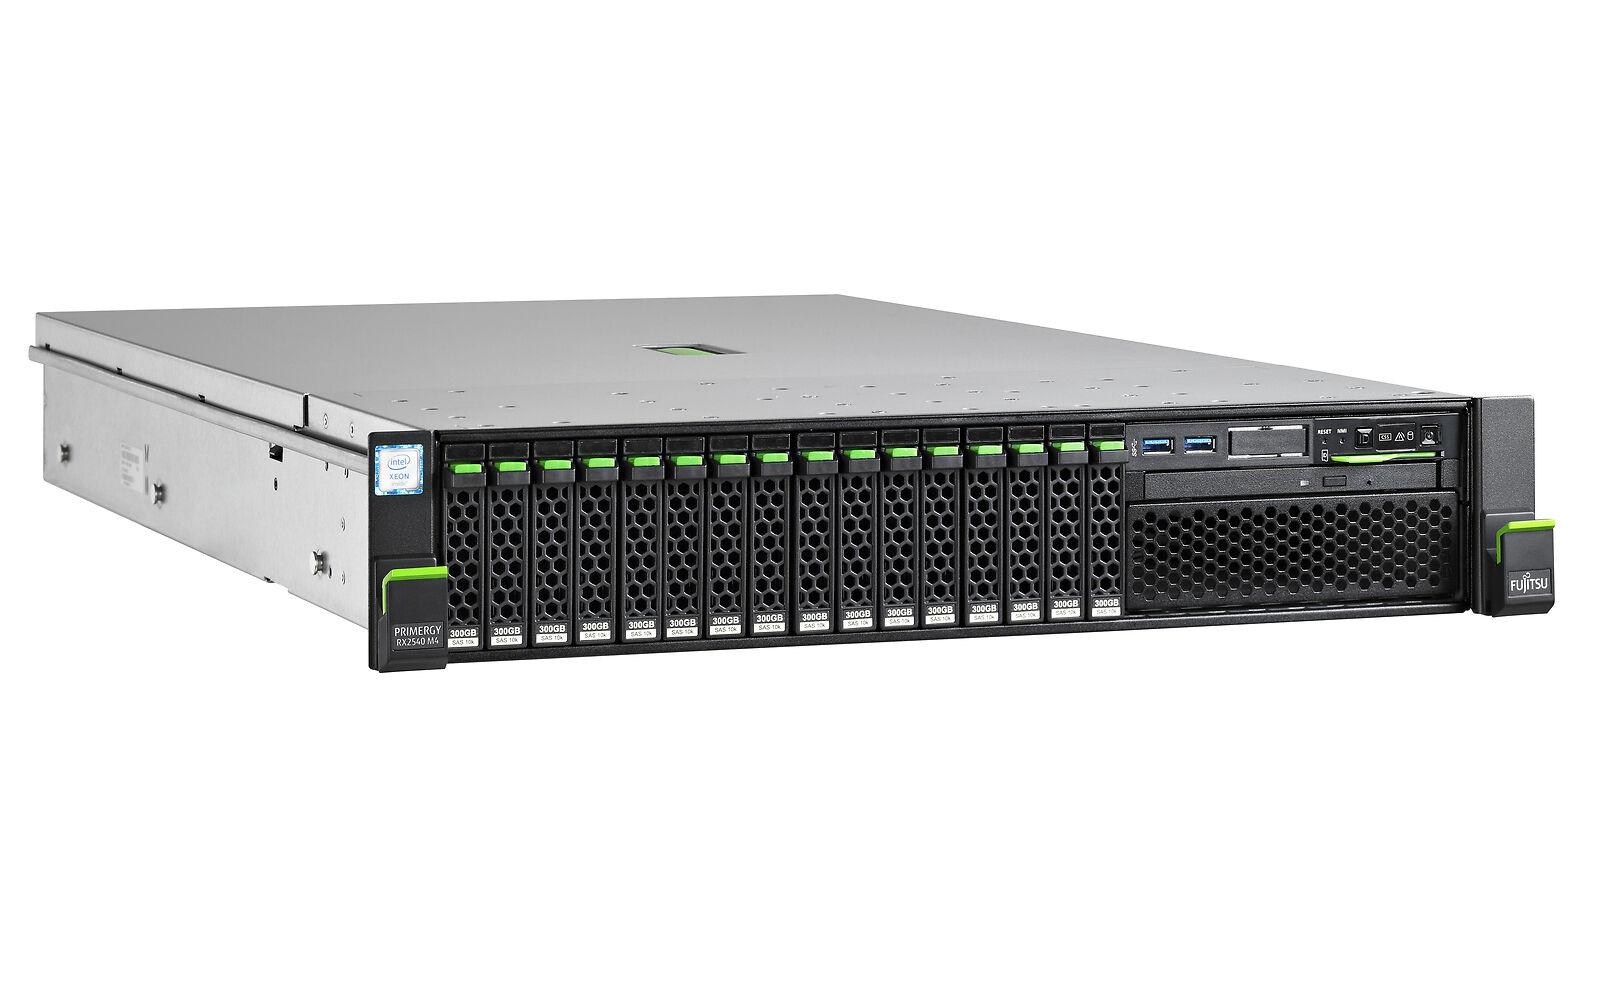 "Fujitsu, RX2540, M4, Xeon, Silver, 4110, (1/2), 16GB, DDR4-2666, R, ECC, (1/24), SSD/SAS/SATA, 2.5"", (0/24), EP540i, IRMC, 800,"